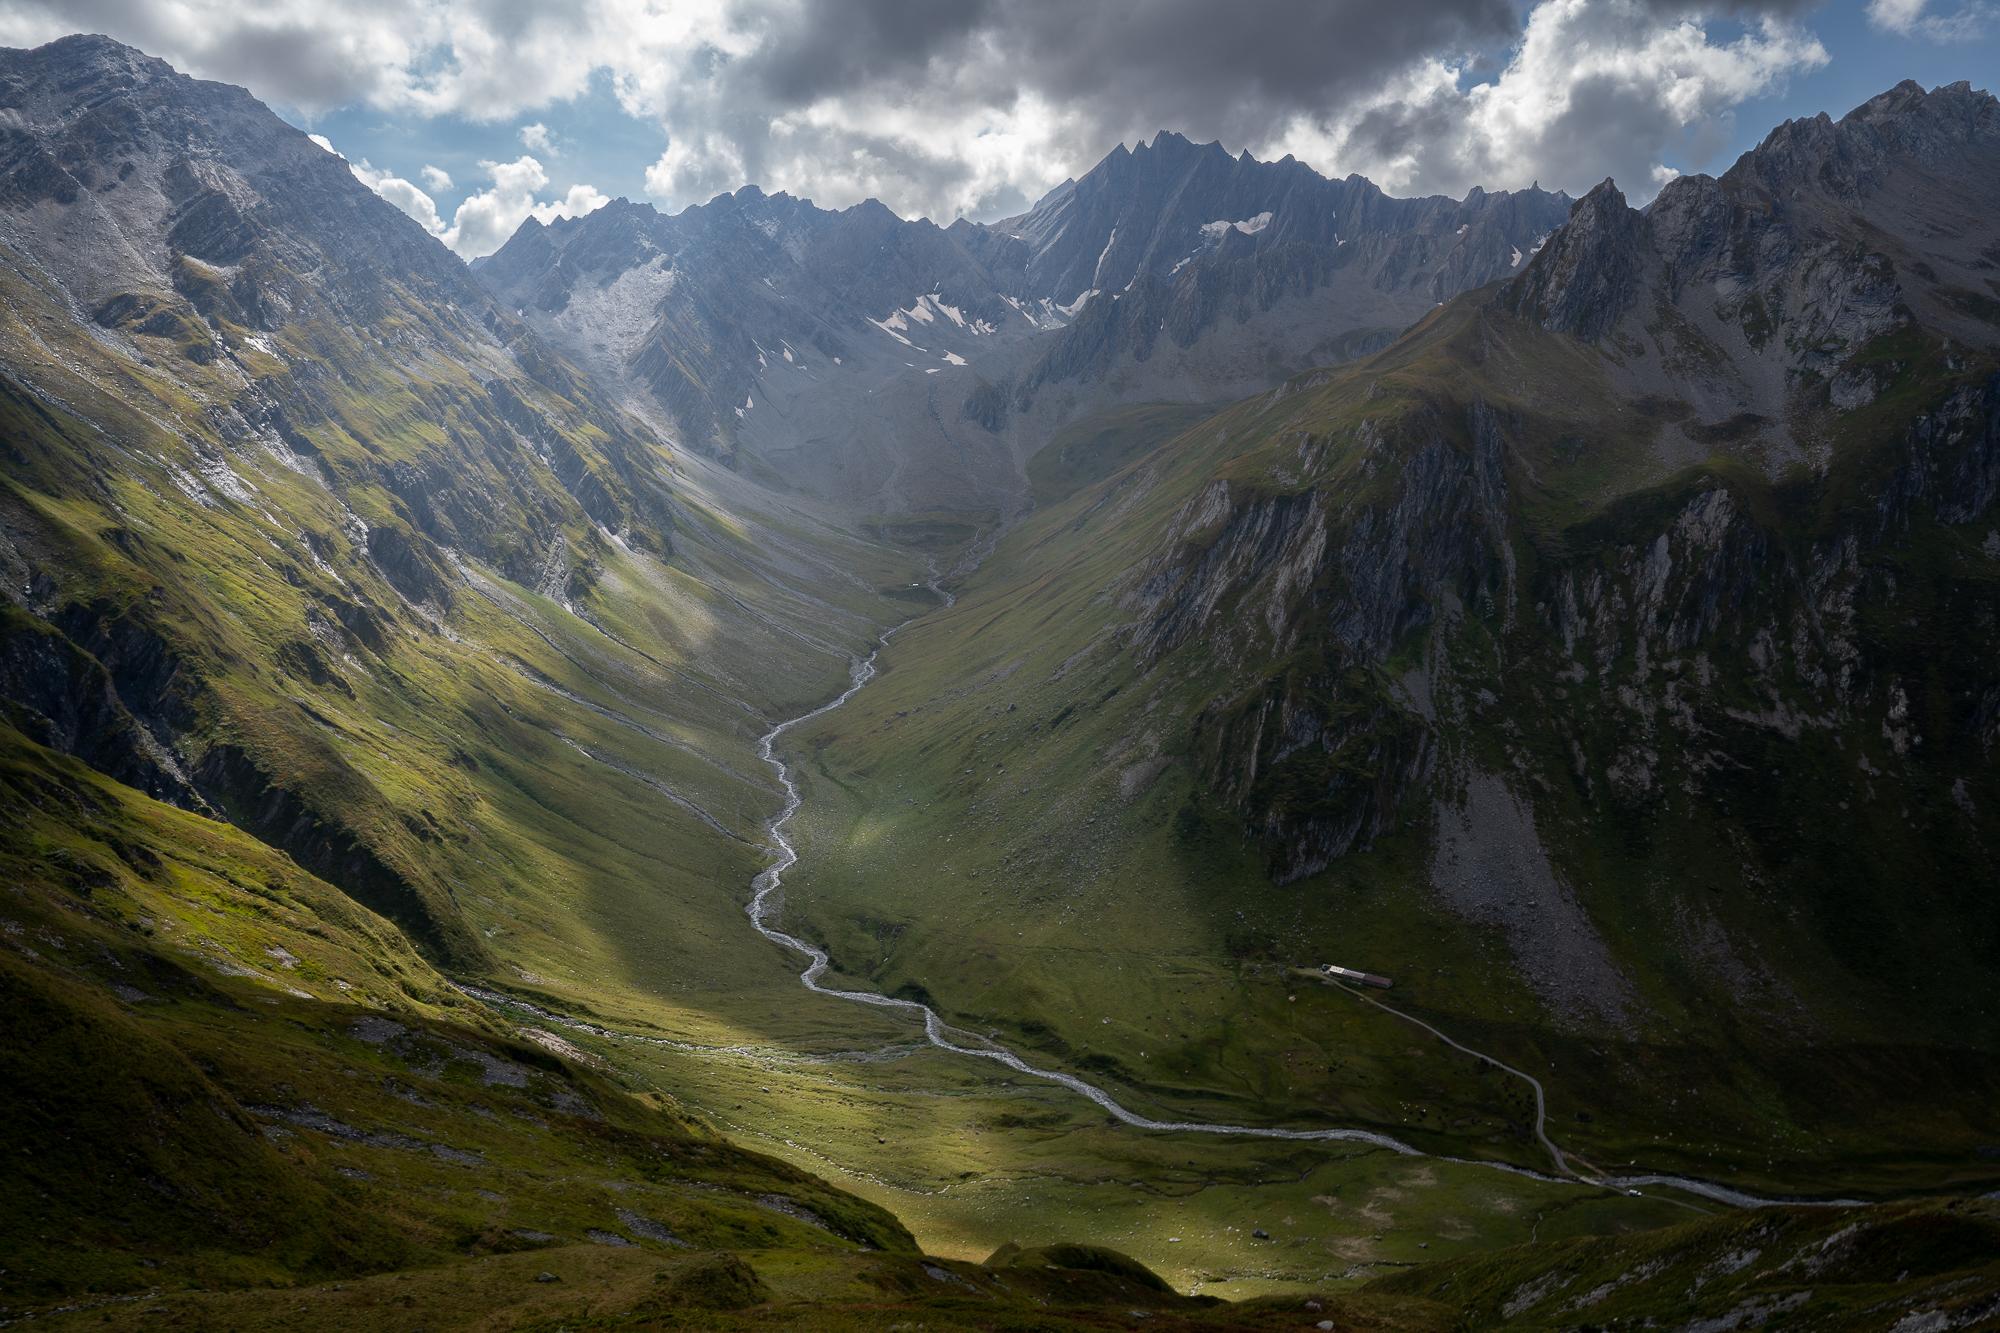 Dranse valley, Switzerland